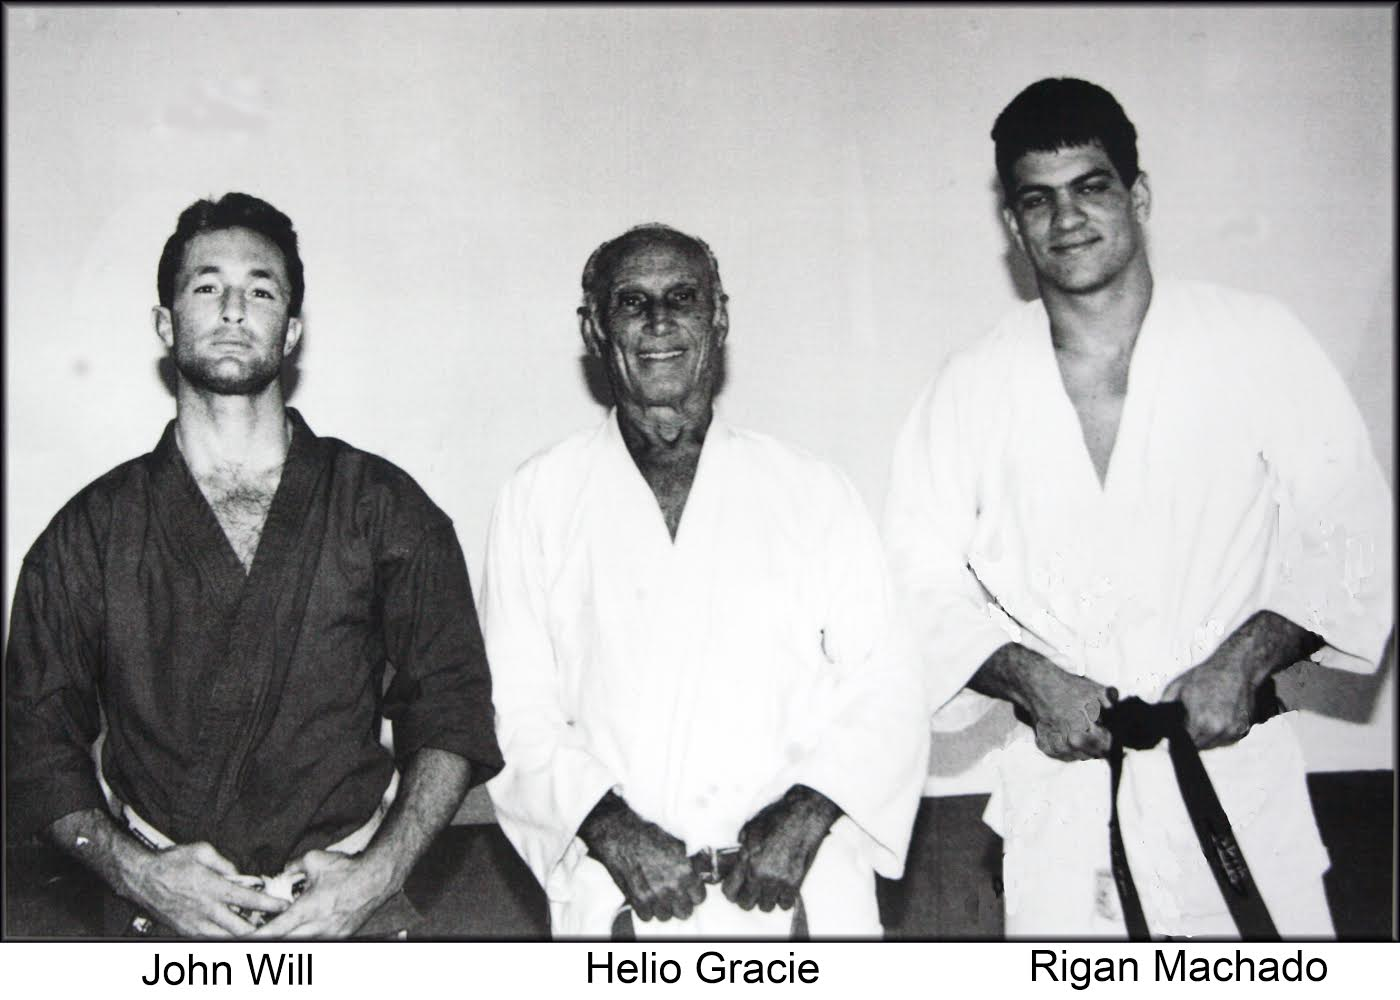 John Will, Helio Gracie, Rigan Machado, Brazilian Jiu Jitsu, Martial Arts Lifestyle, BJJ, MMA, Hollywood Jiu Jitsu, martial arts training, martial arts philosophy.